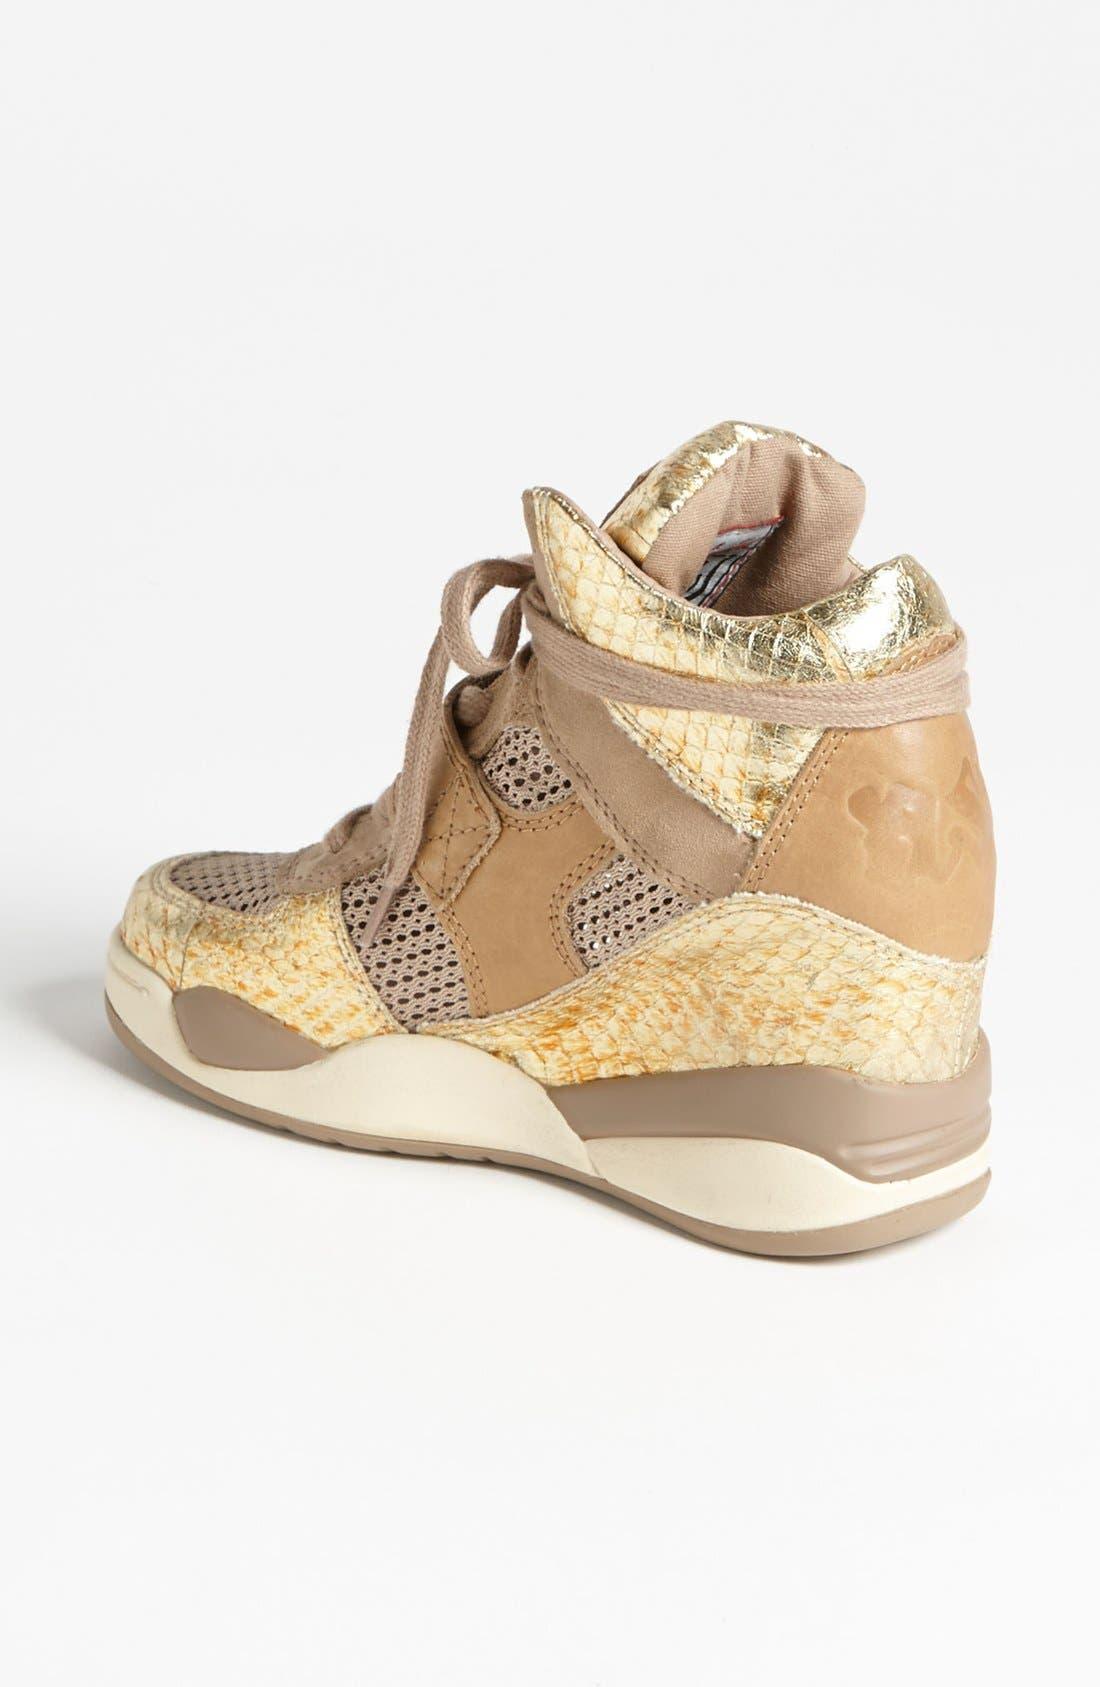 Alternate Image 2  - Ash 'Funky' Sneaker (Nordstrom Exclusive)